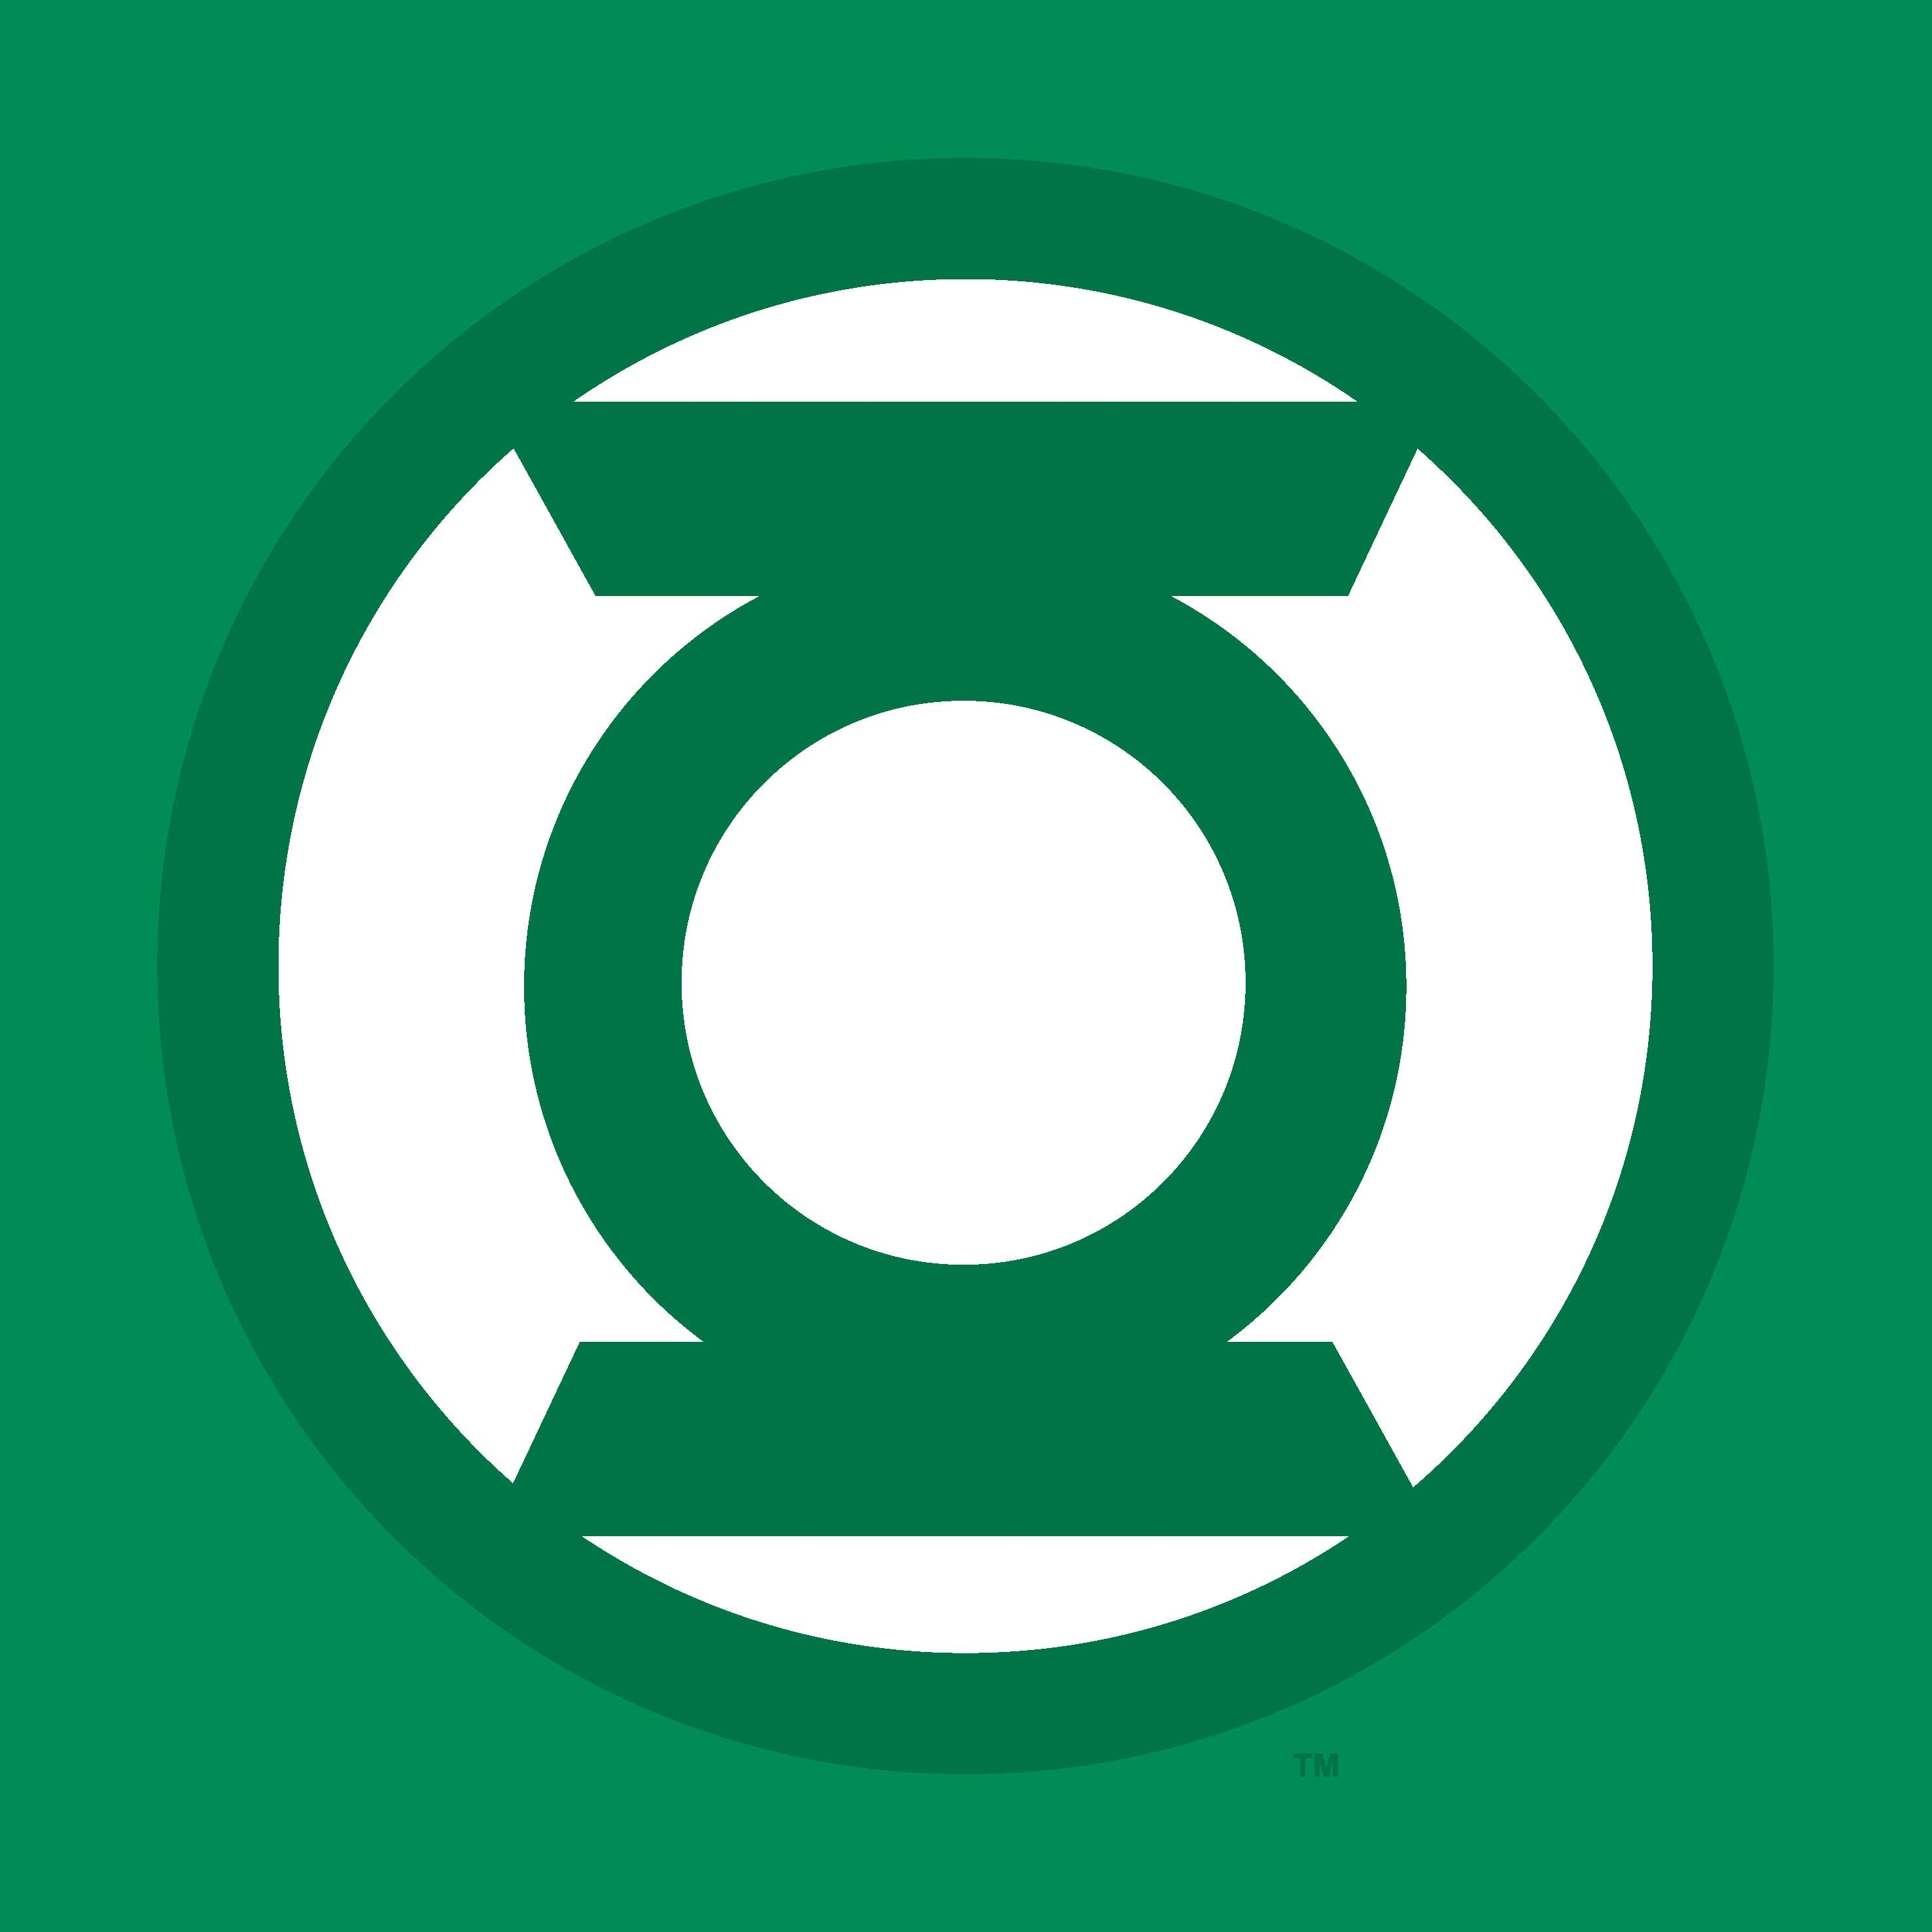 green lantern logo super hero pinterest. Black Bedroom Furniture Sets. Home Design Ideas